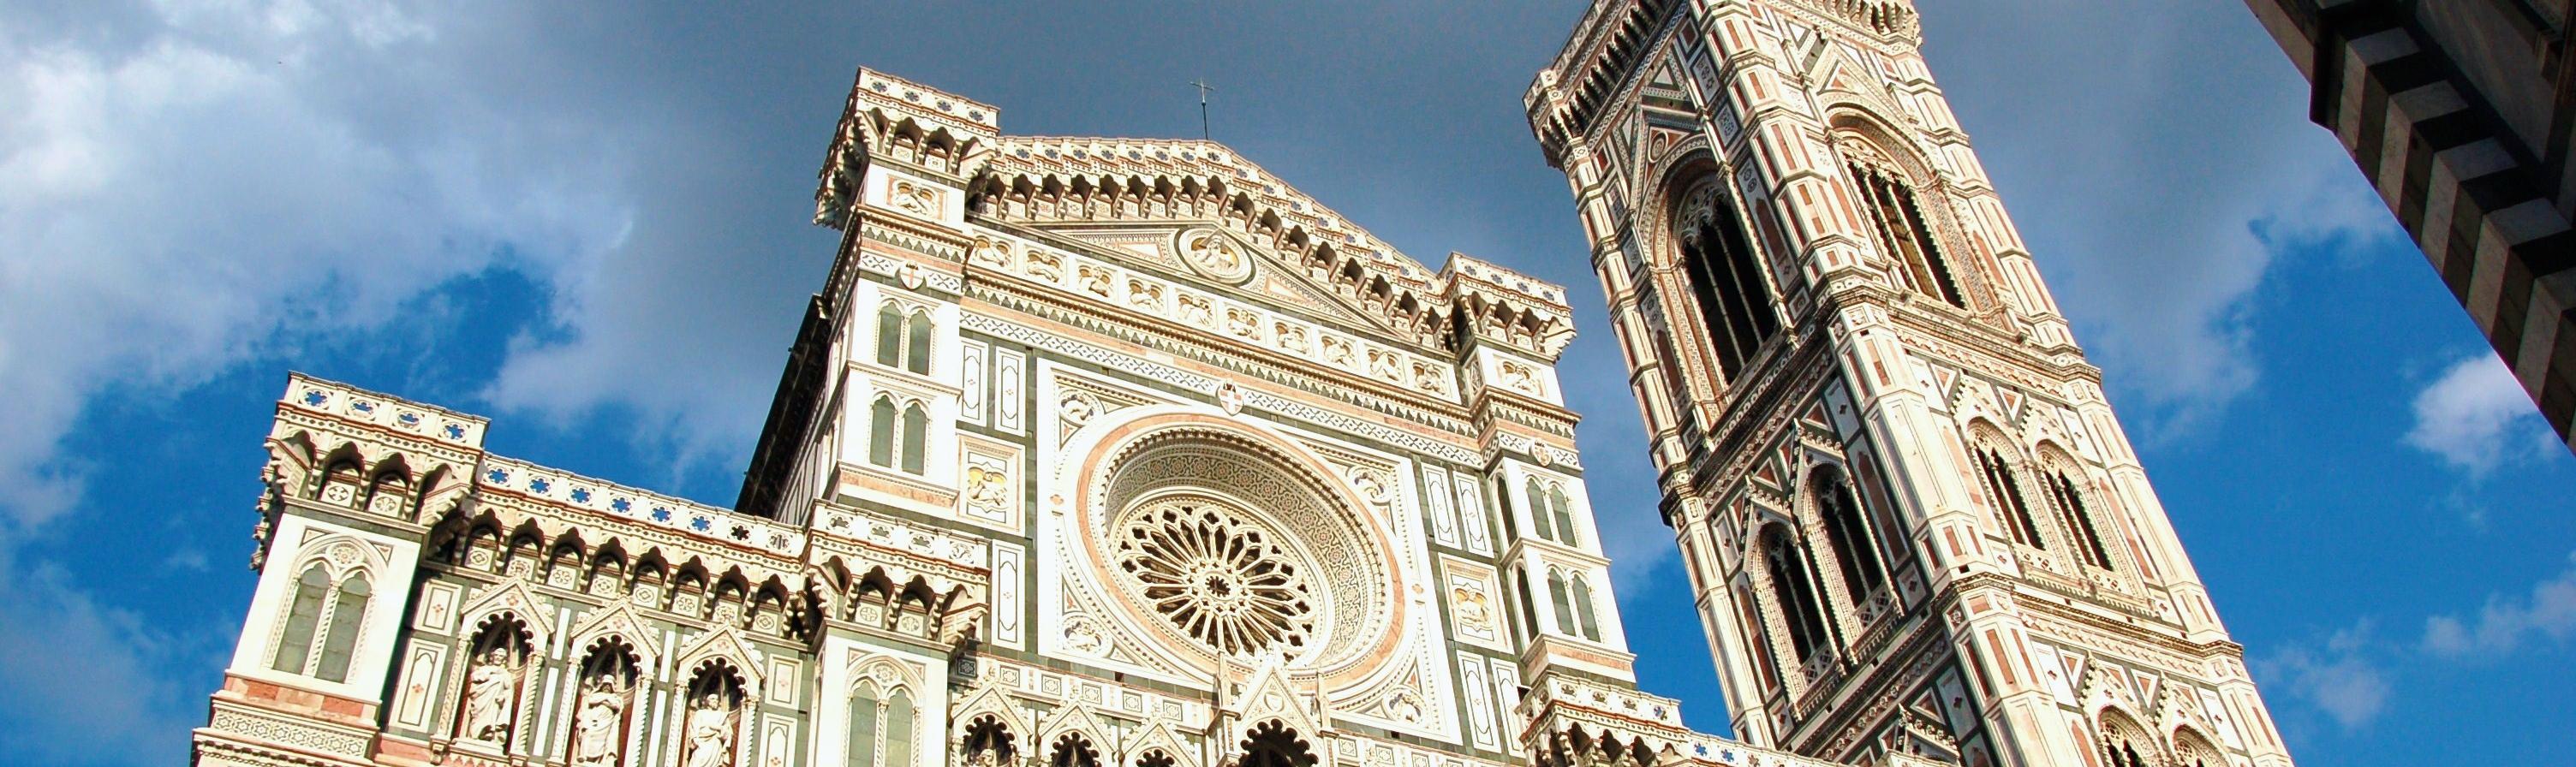 Doumo, Florencia